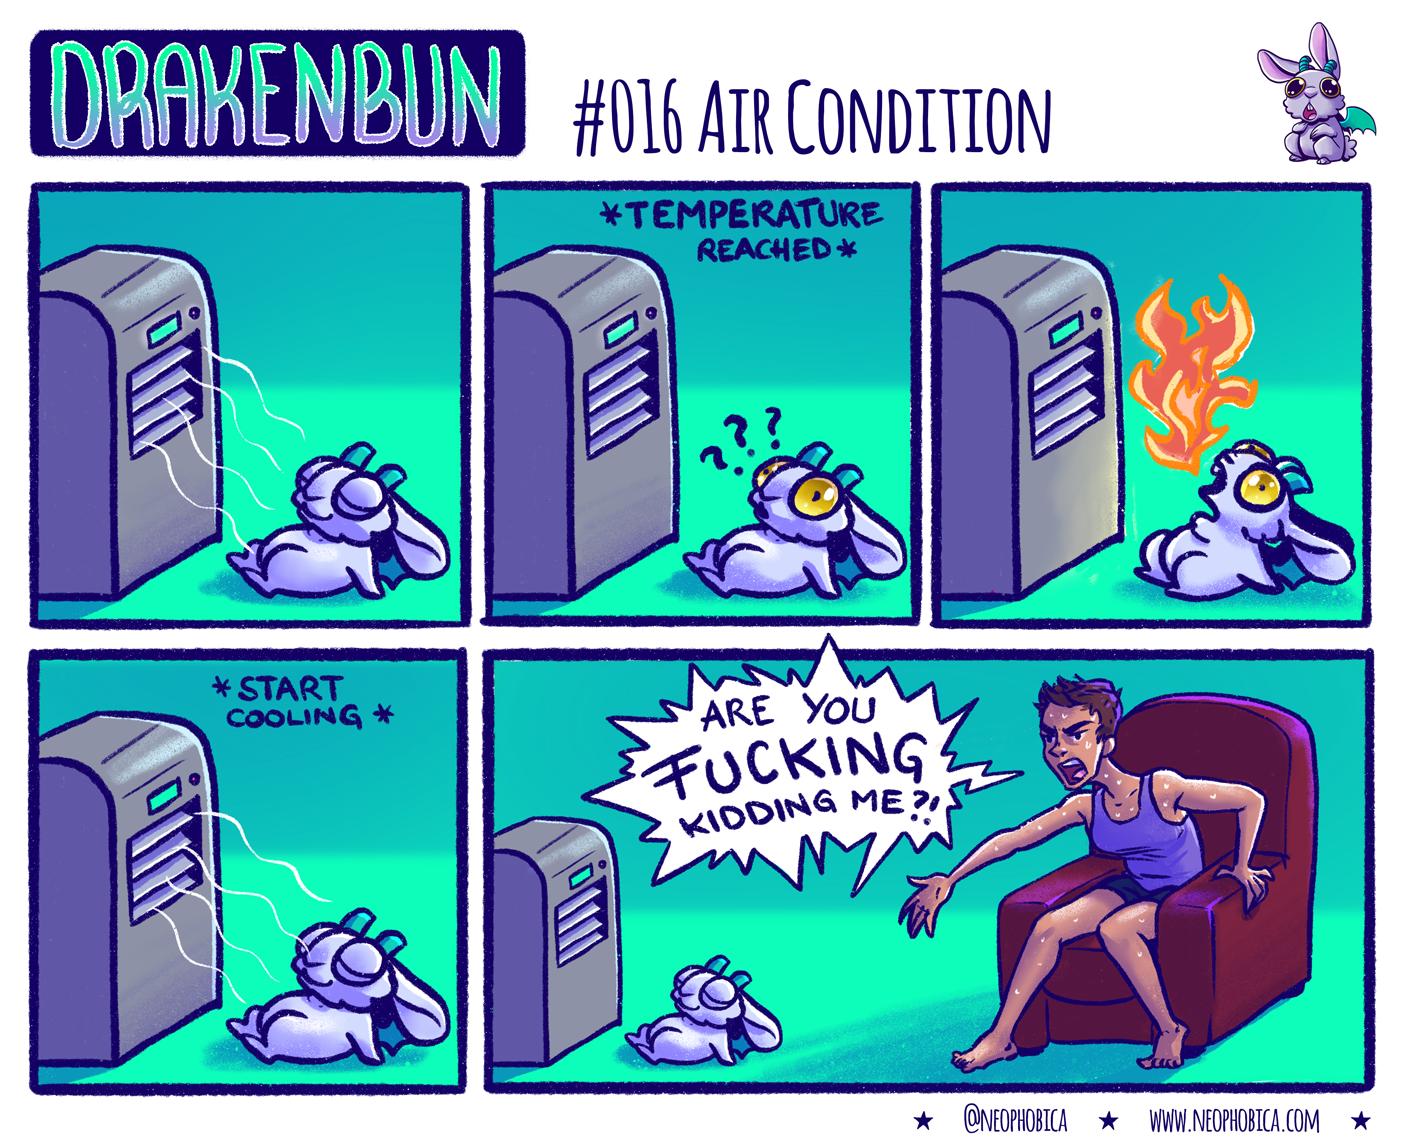 #016 Air Condition